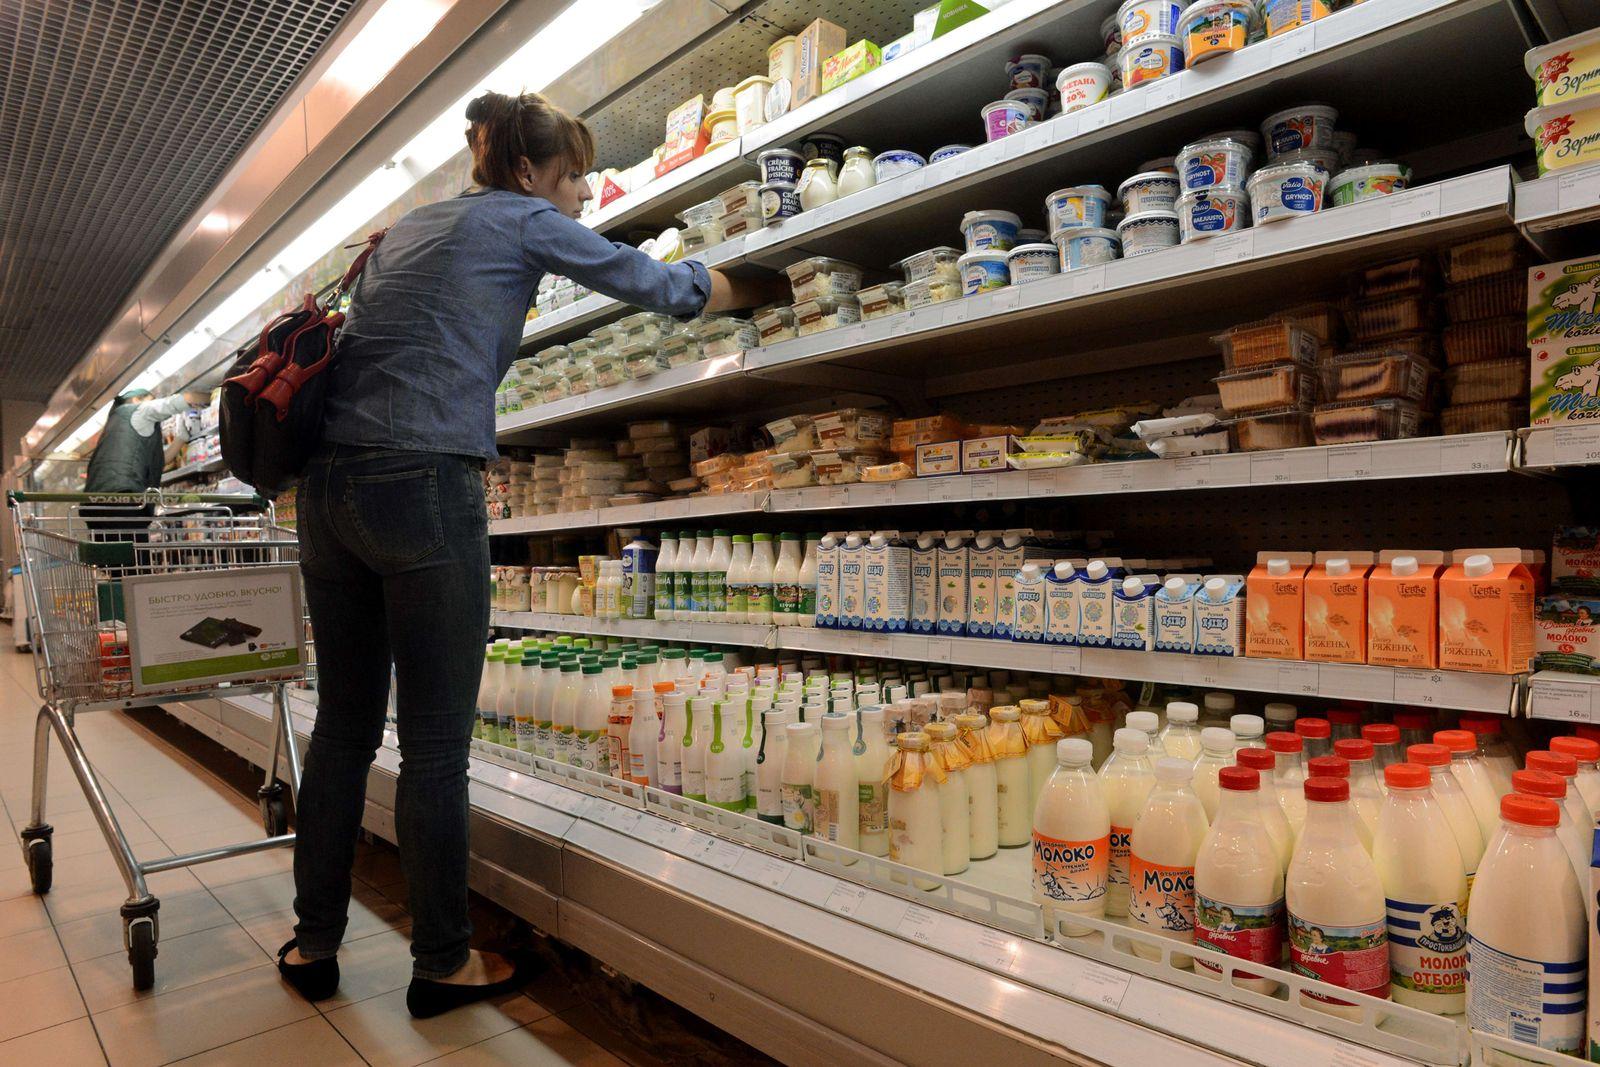 Russland / Lebensmittel / Import / Markt